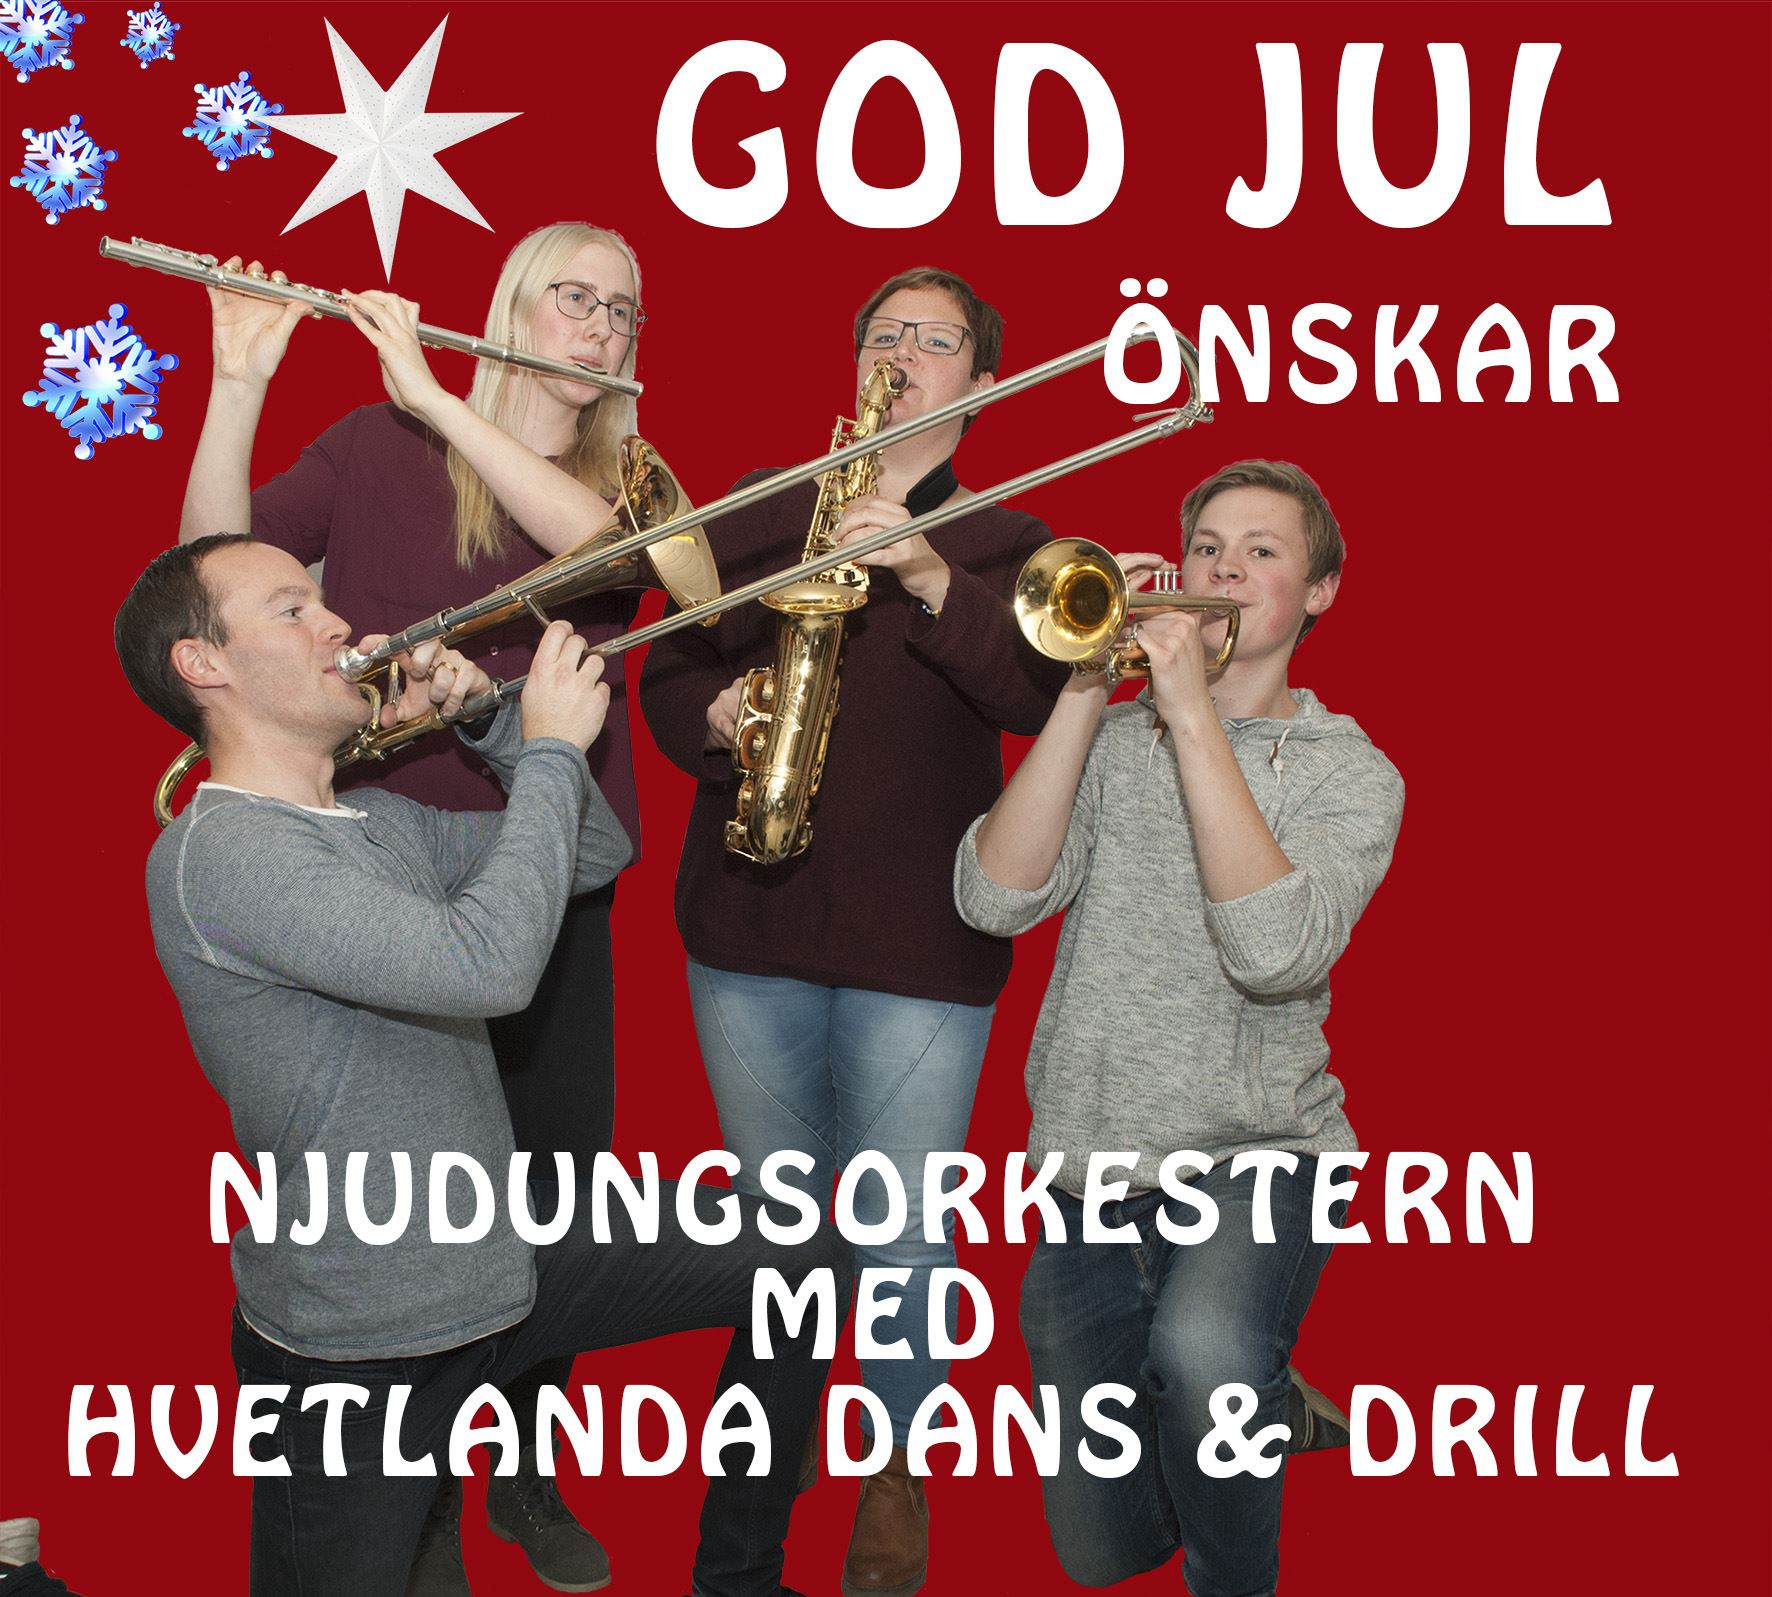 Njudungsorkestern spelar in julen